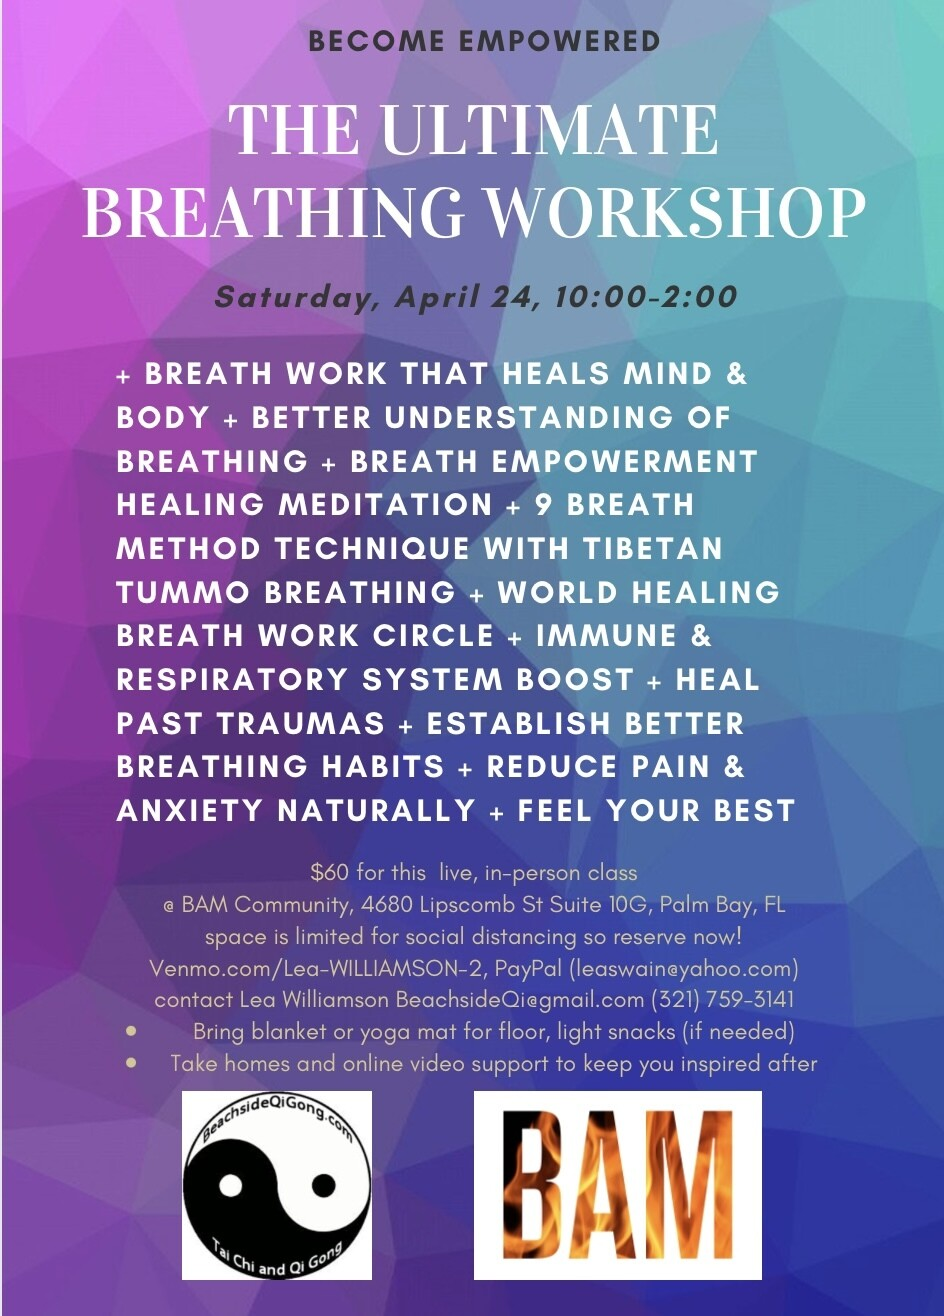 The Ultimate Breathing Workshop